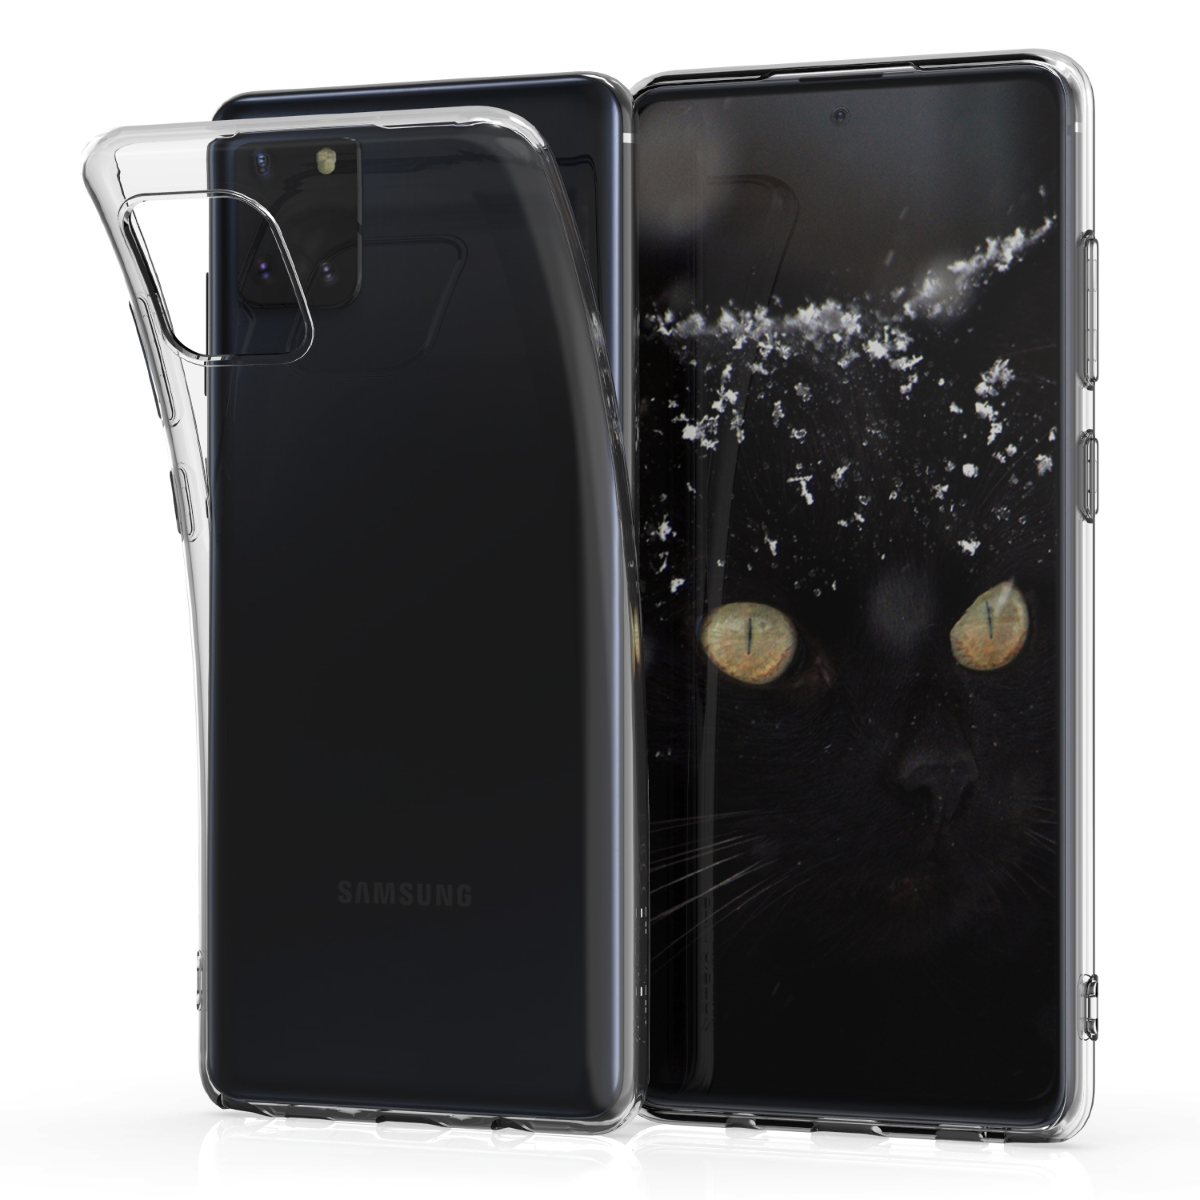 KW Θήκη Σιλικόνης Samsung Galaxy Note 10 Lite - Transparent (51370.03)